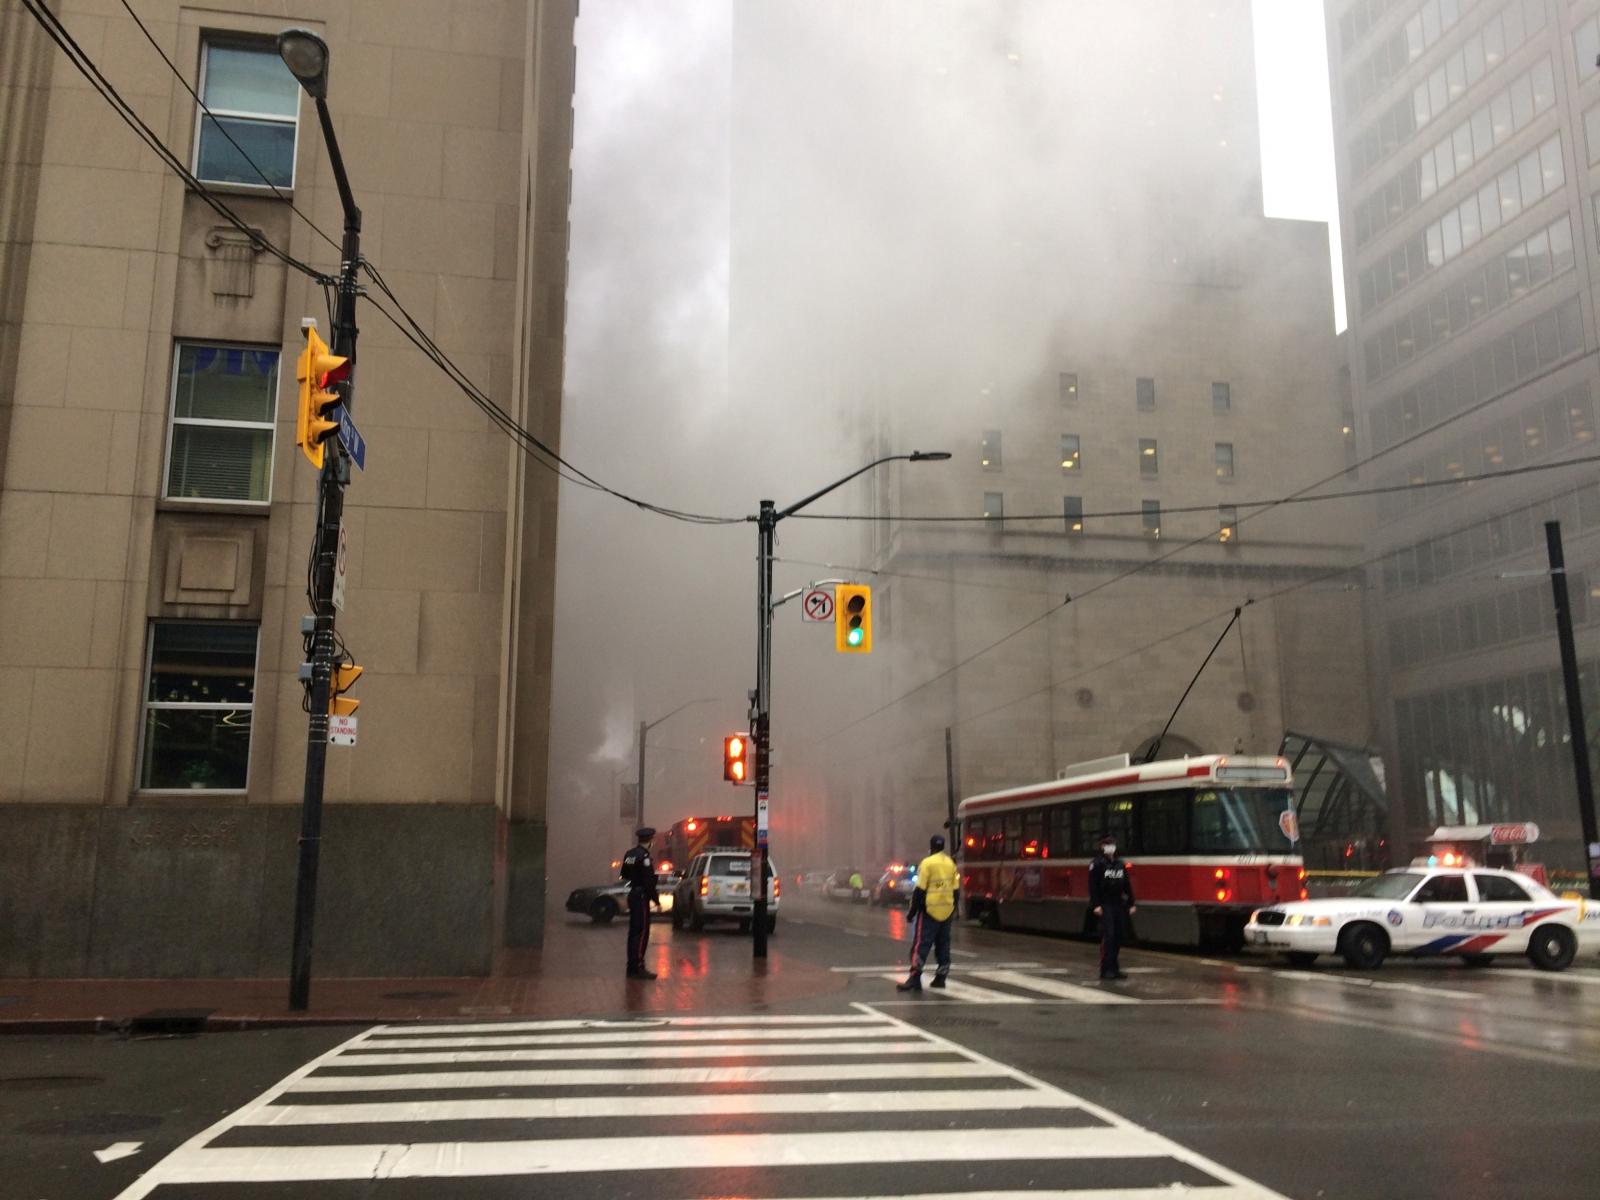 Toronto financial district fire